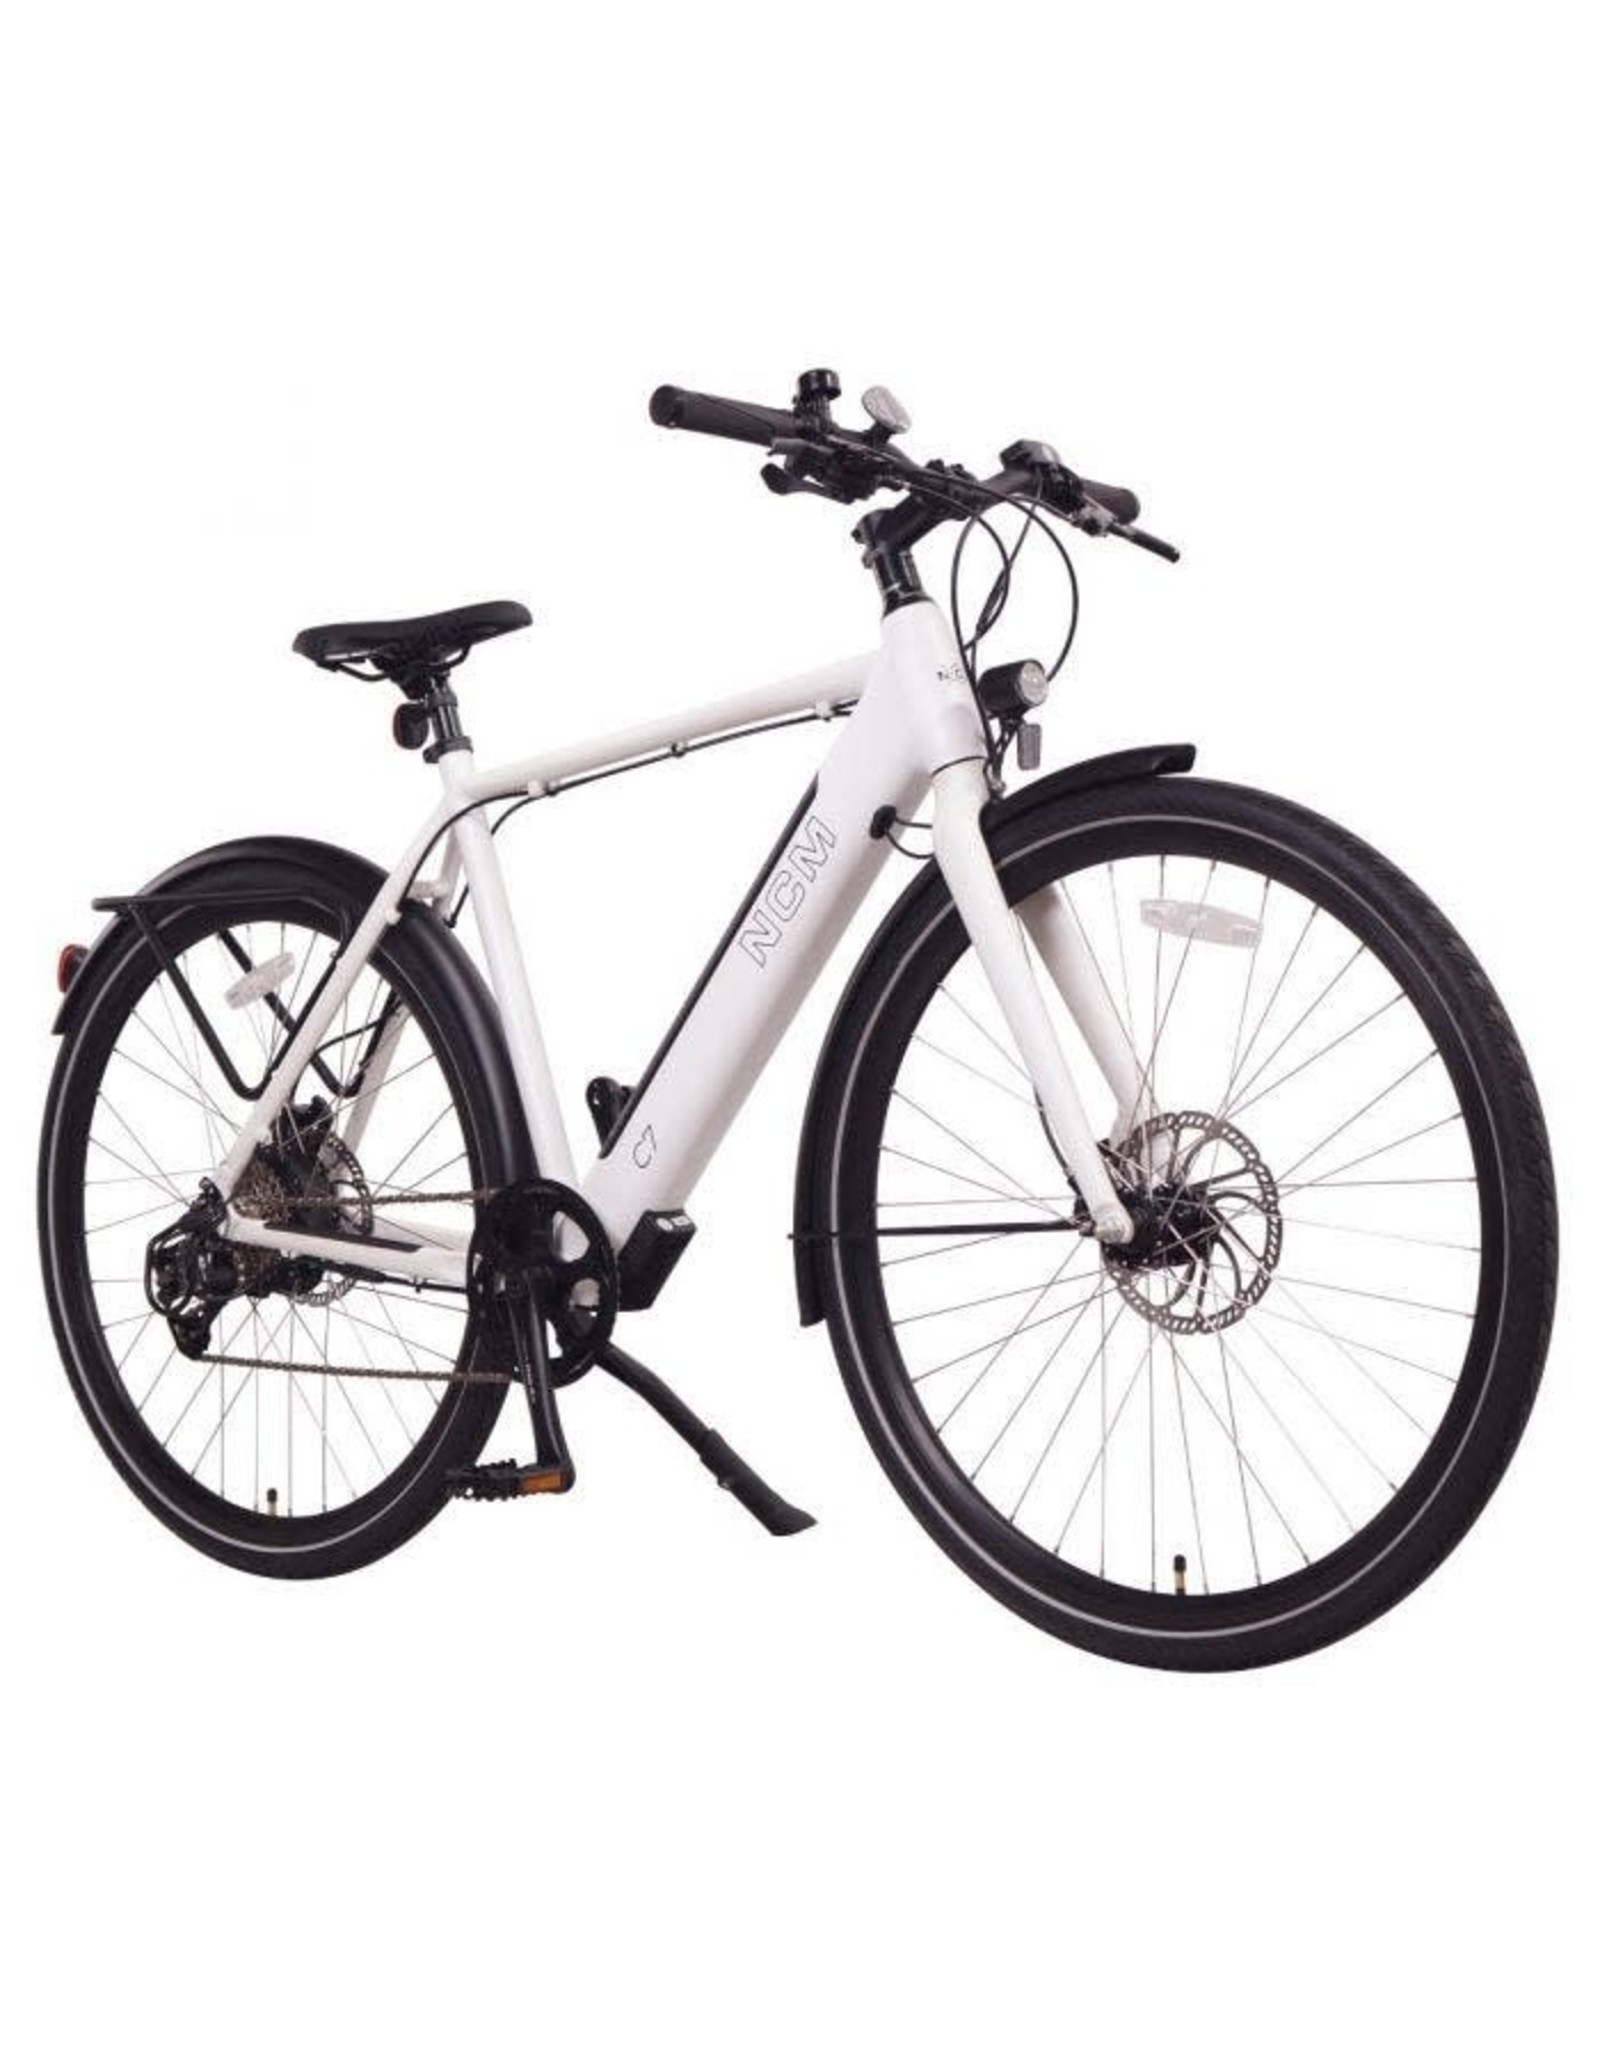 LEON CYCLE Leon Cycle NCM C7 white electric hybrid bike